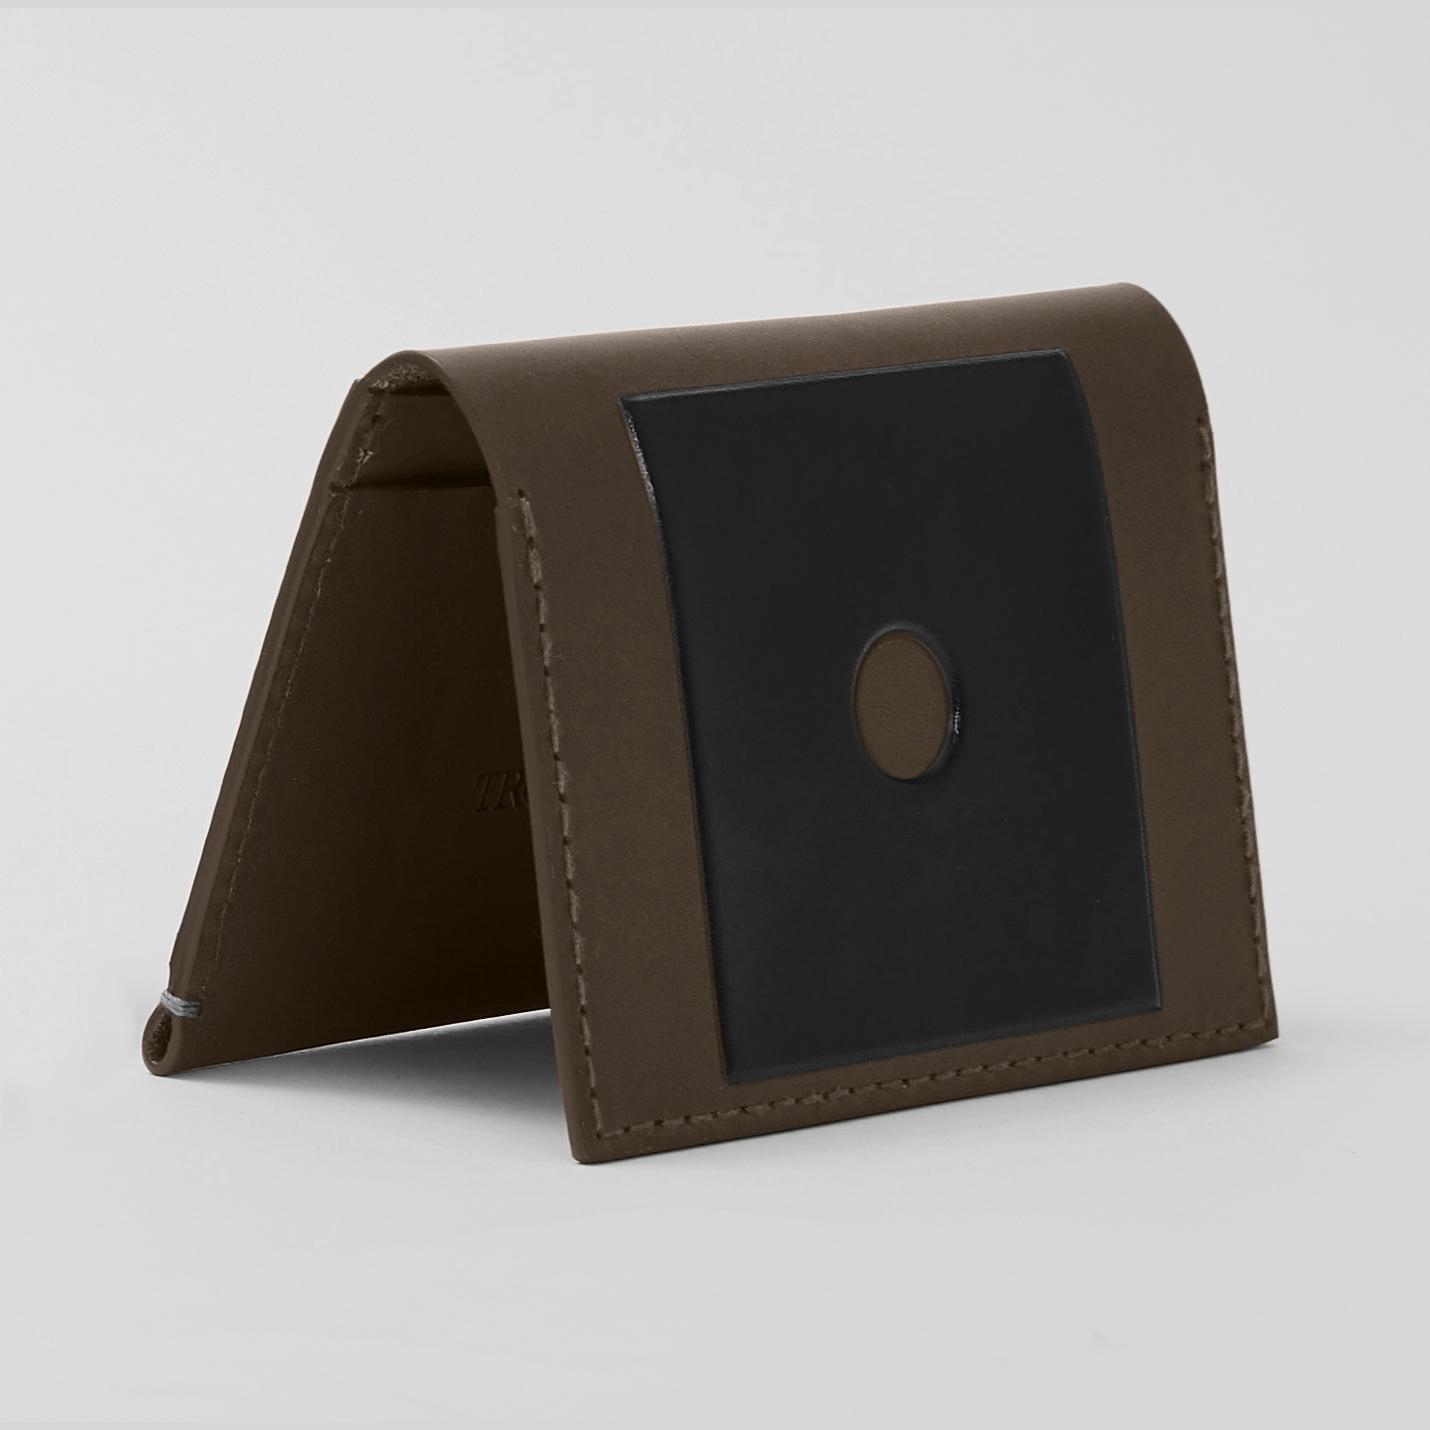 NEW Troubadour Colourful Wallet Collection - Khaki Card Wallet.jpg